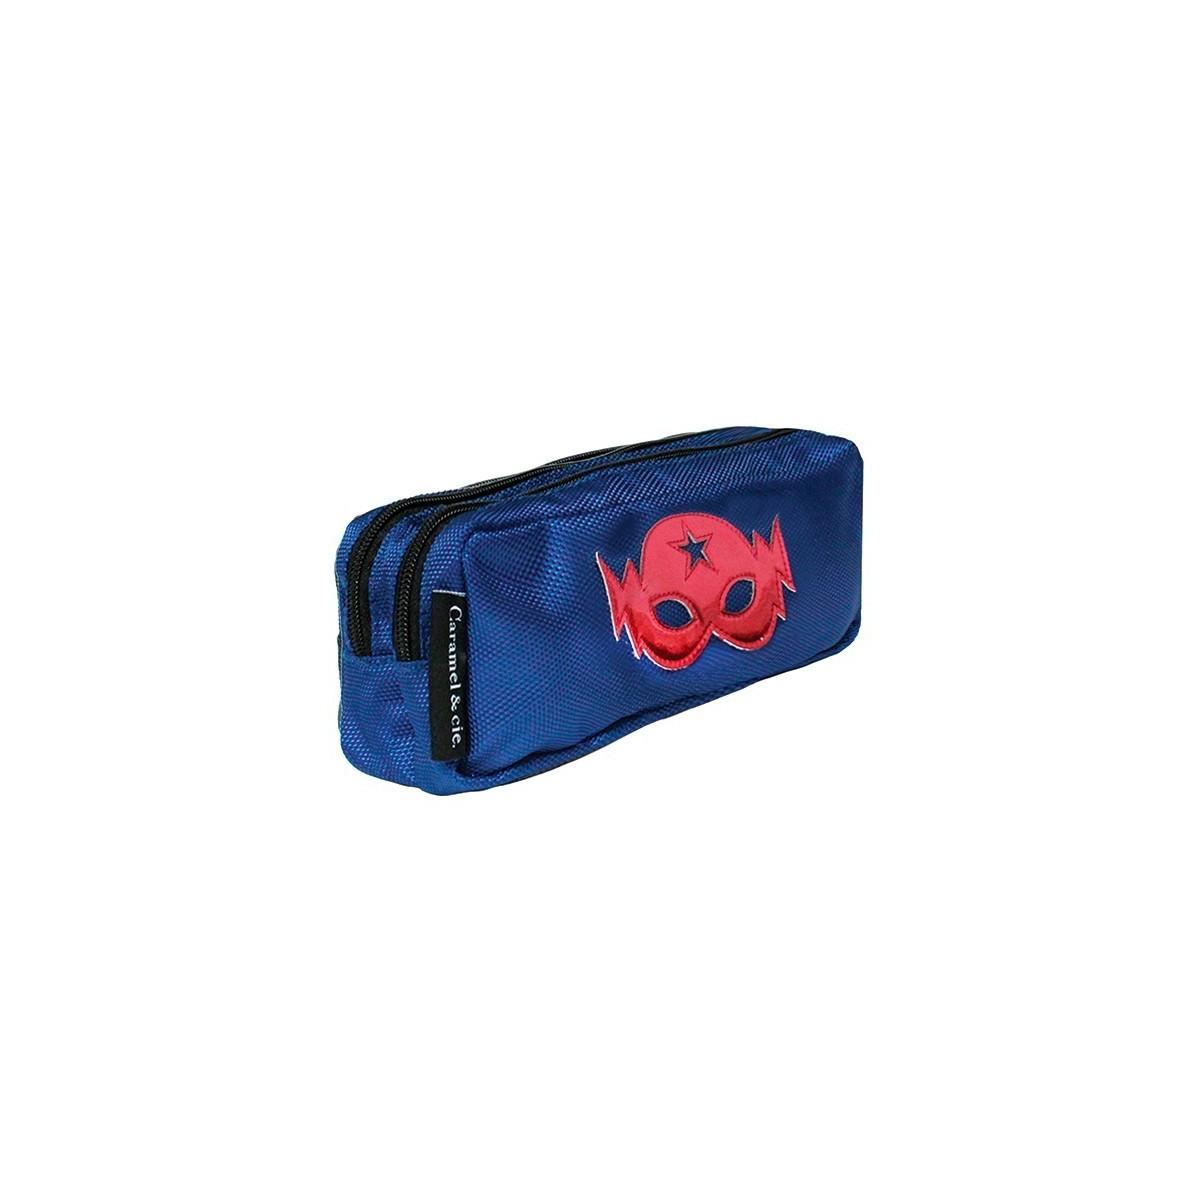 Trousse DBL Masque Bleu